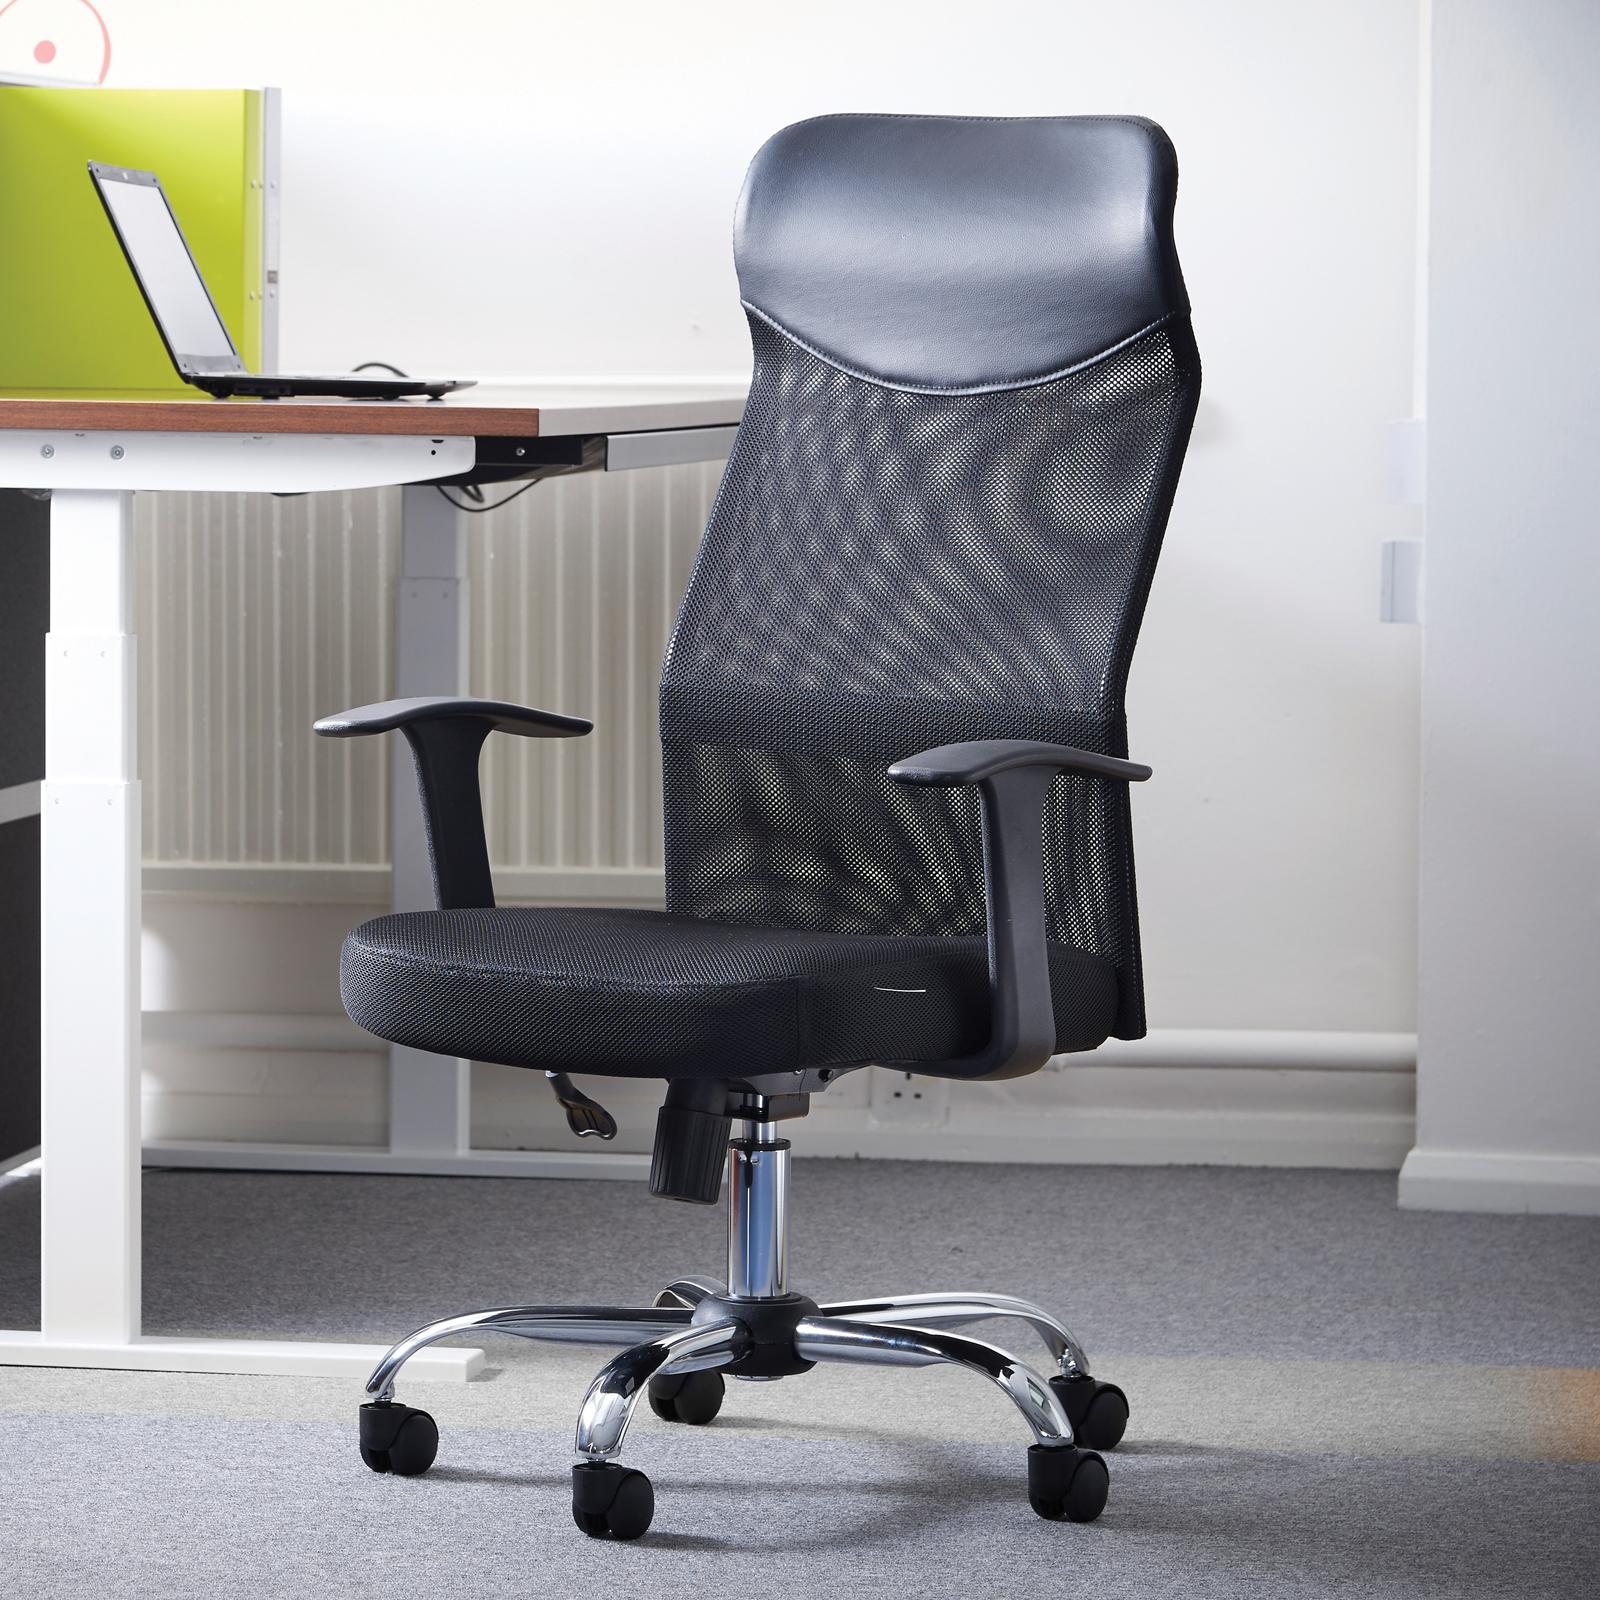 Chairs Aurora high back mesh operators chair - black